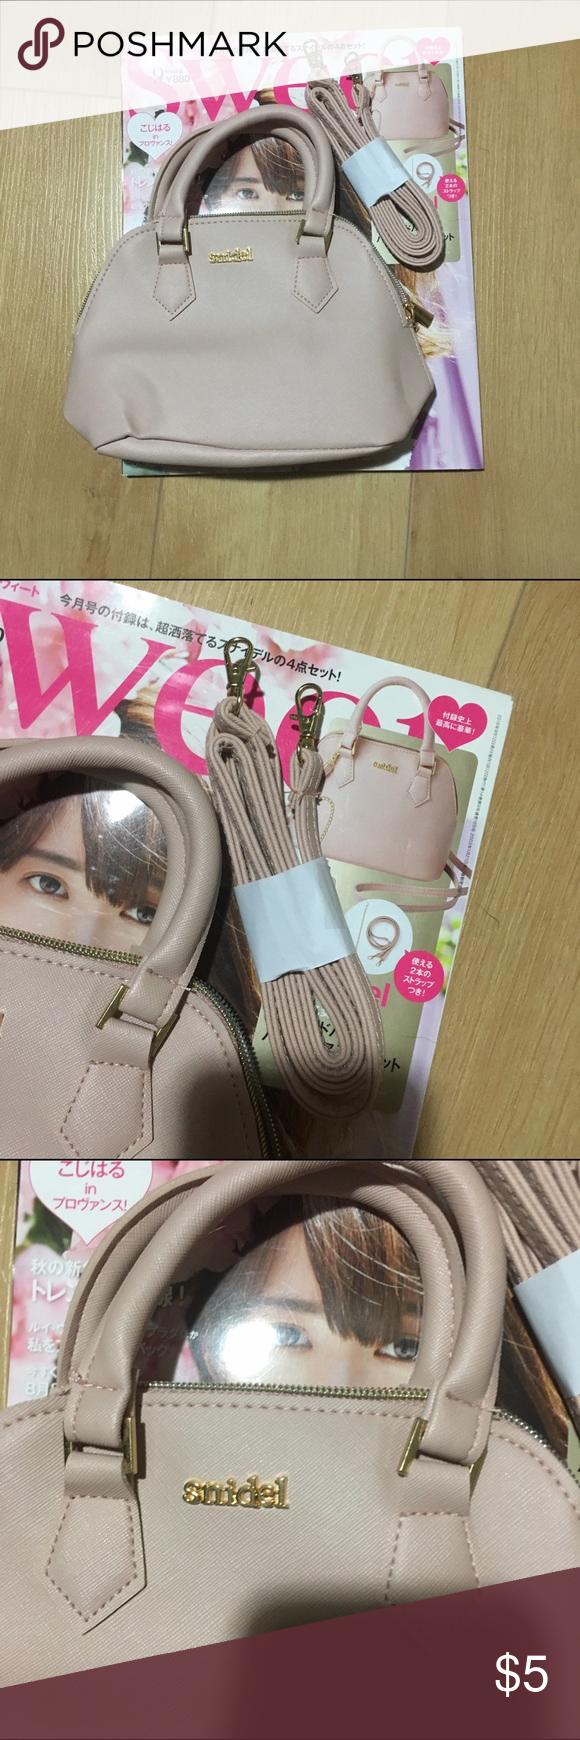 Brand new nude pink Japanese Snidel mini bag Brand new nude pink Japanese Snidel mini bag with strap snidel Bags Mini Bags